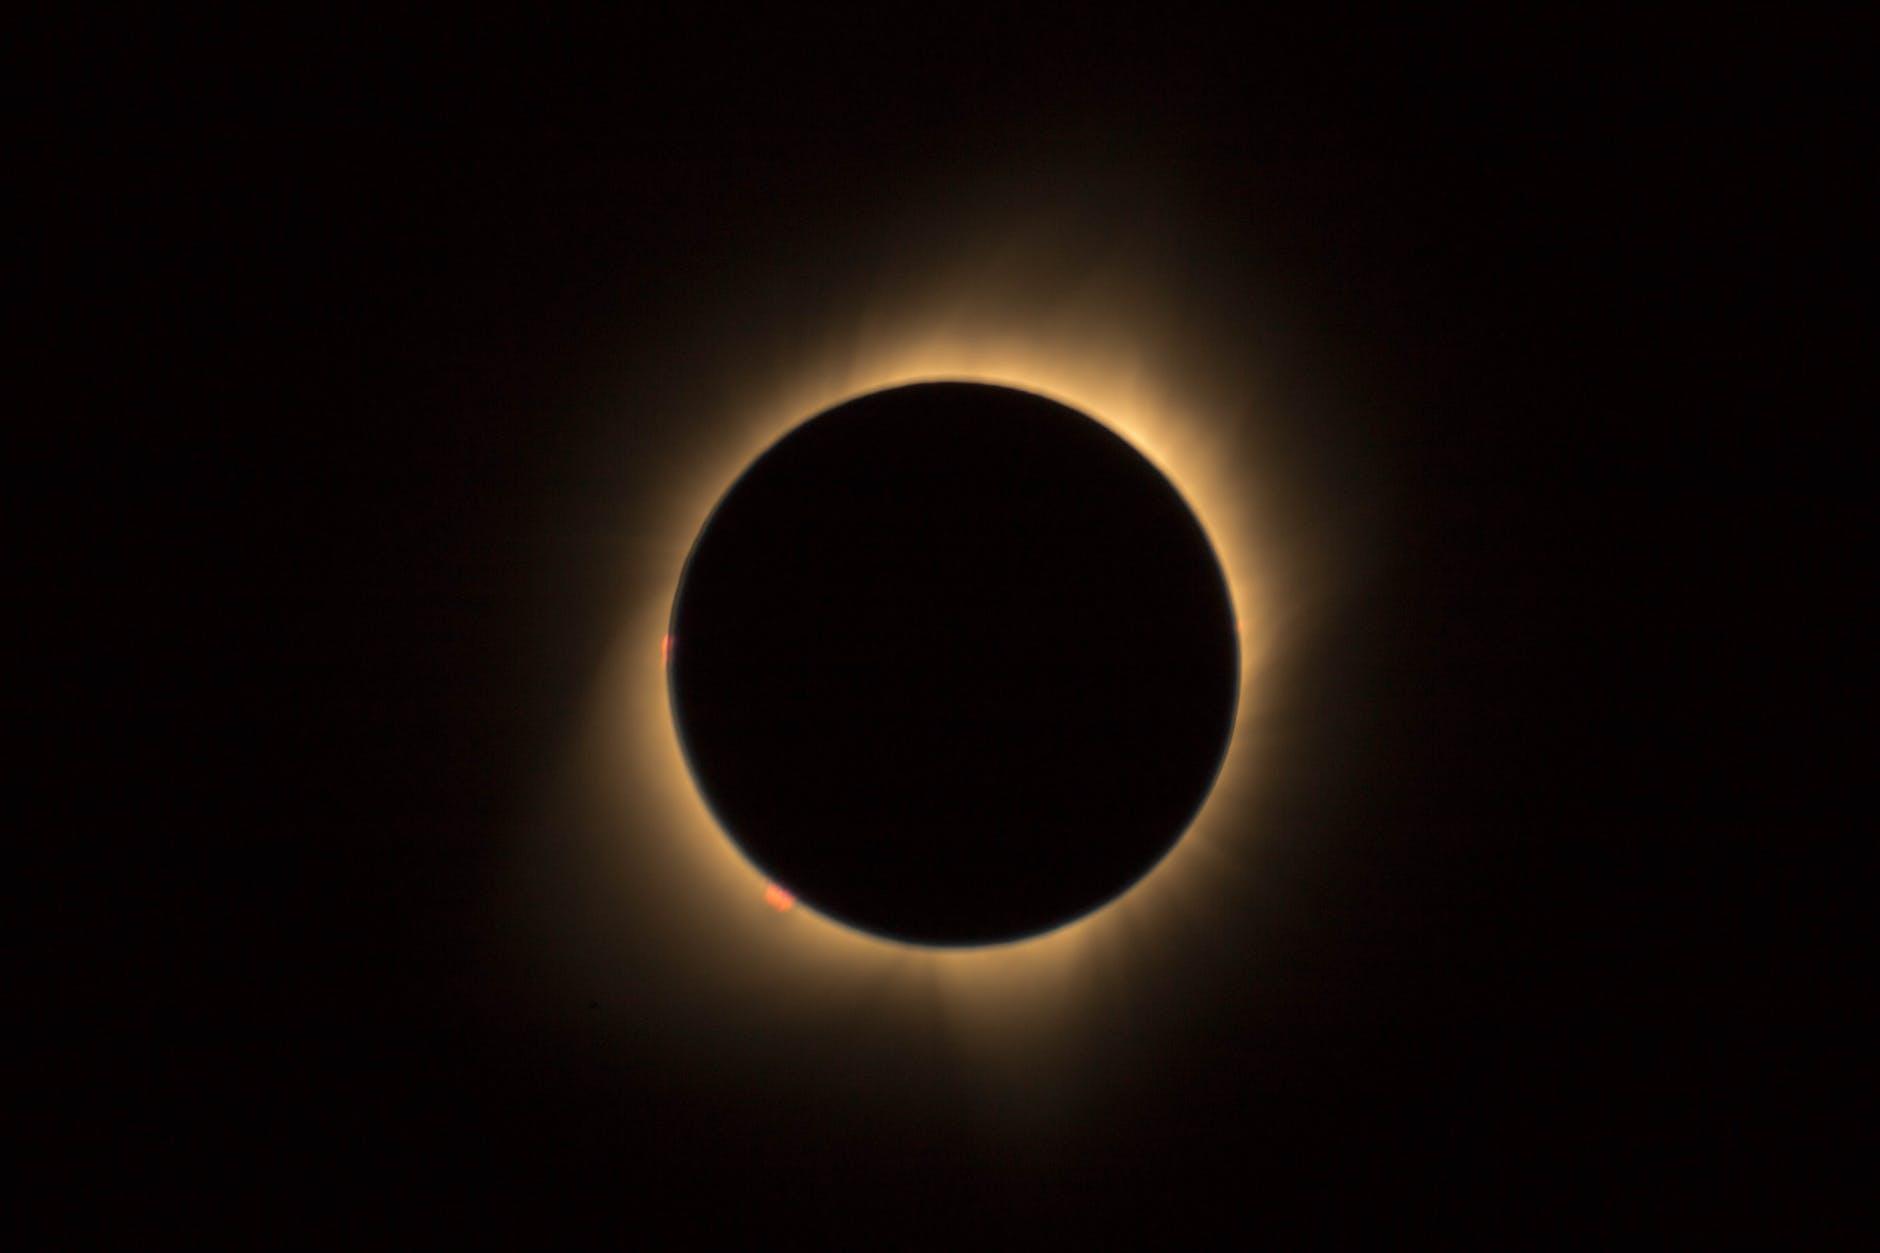 a full solar eclipse